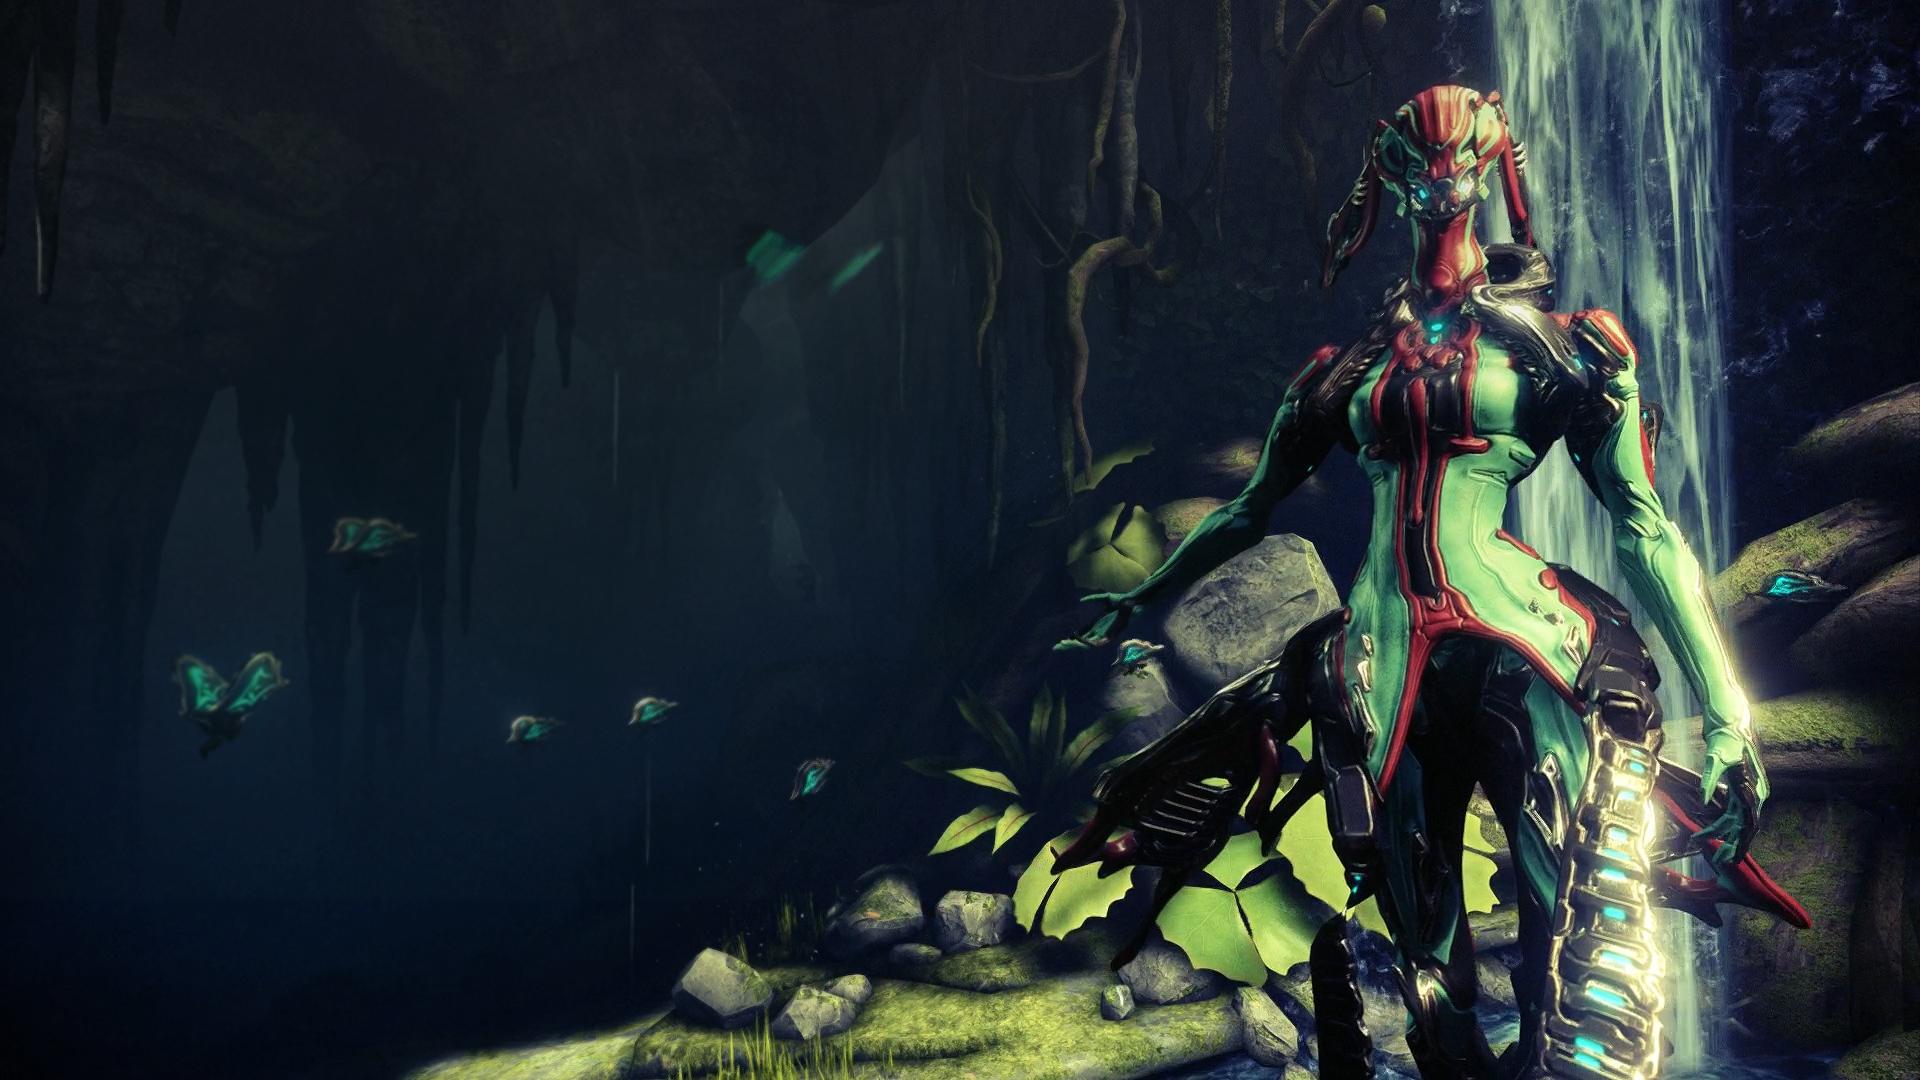 Bad Girl Wallpapers Hd Steam Community Warframe